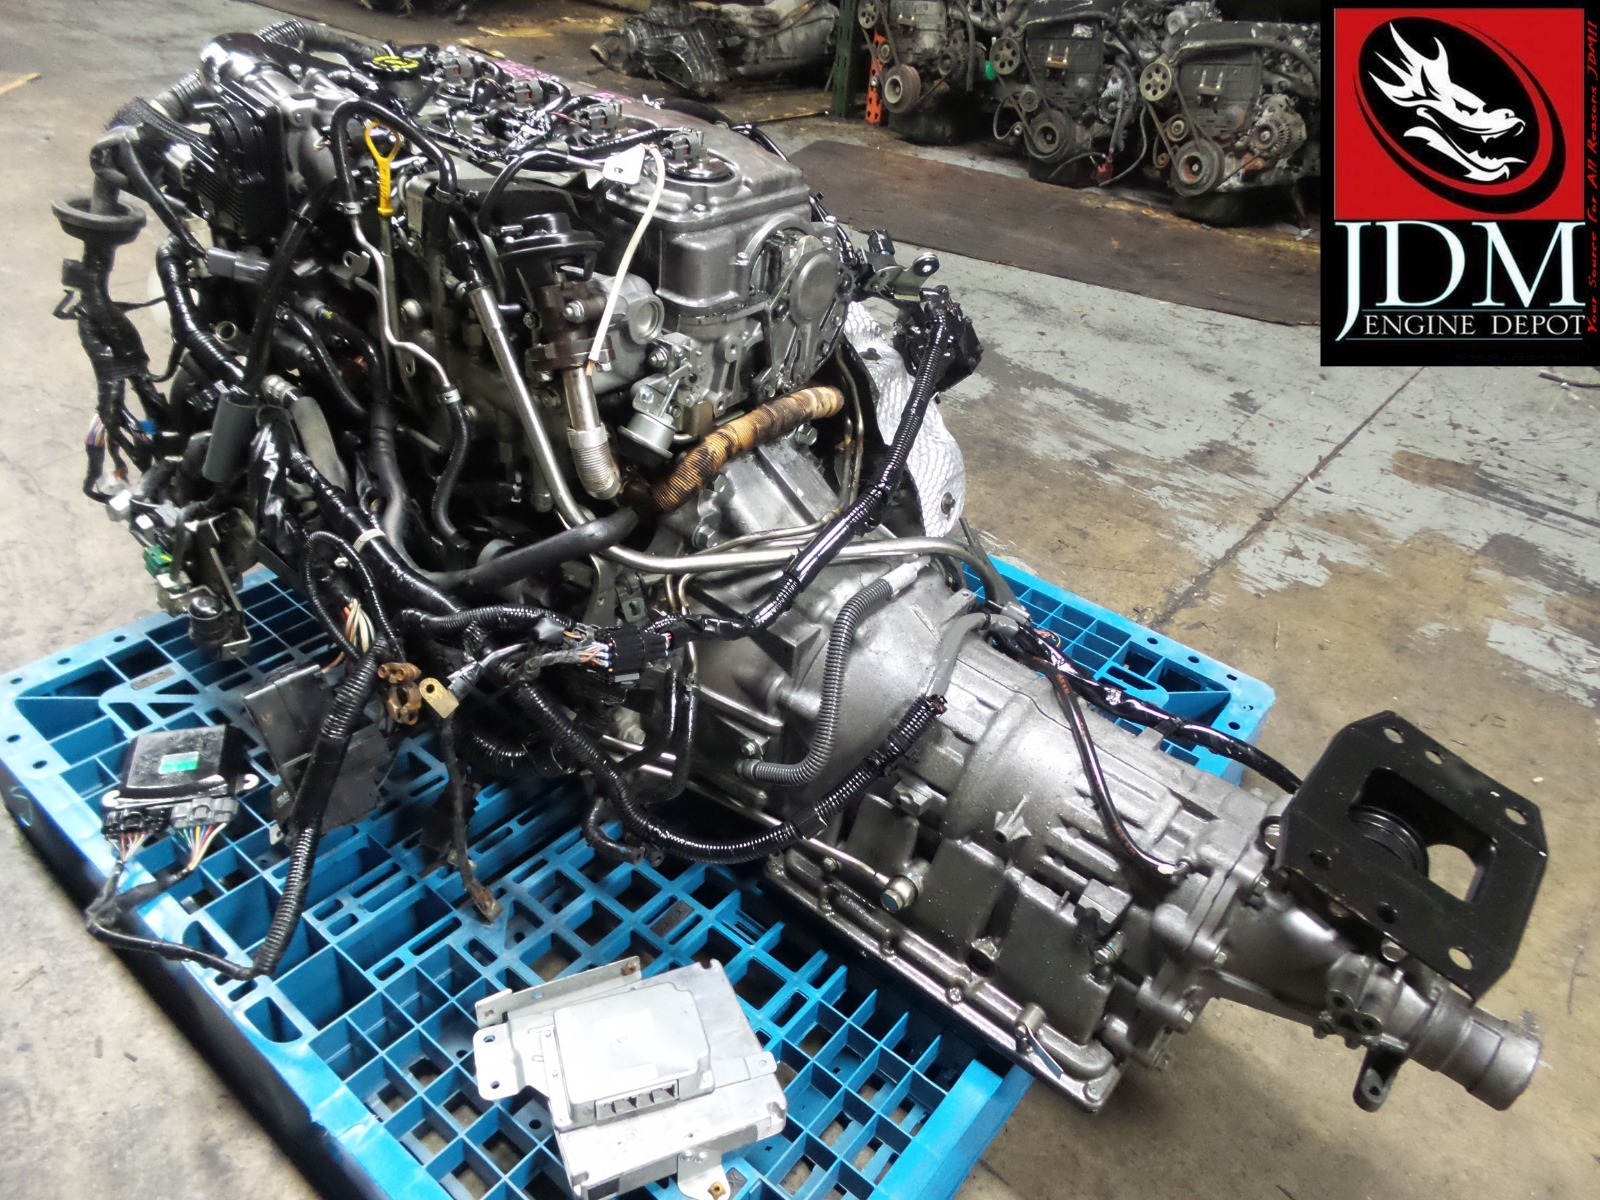 mazda rf turbo diesel engine for sale another cars log s rh cars smartfundingreceiver com New Mazda Diesel Engine mazda rf diesel engine repair manual